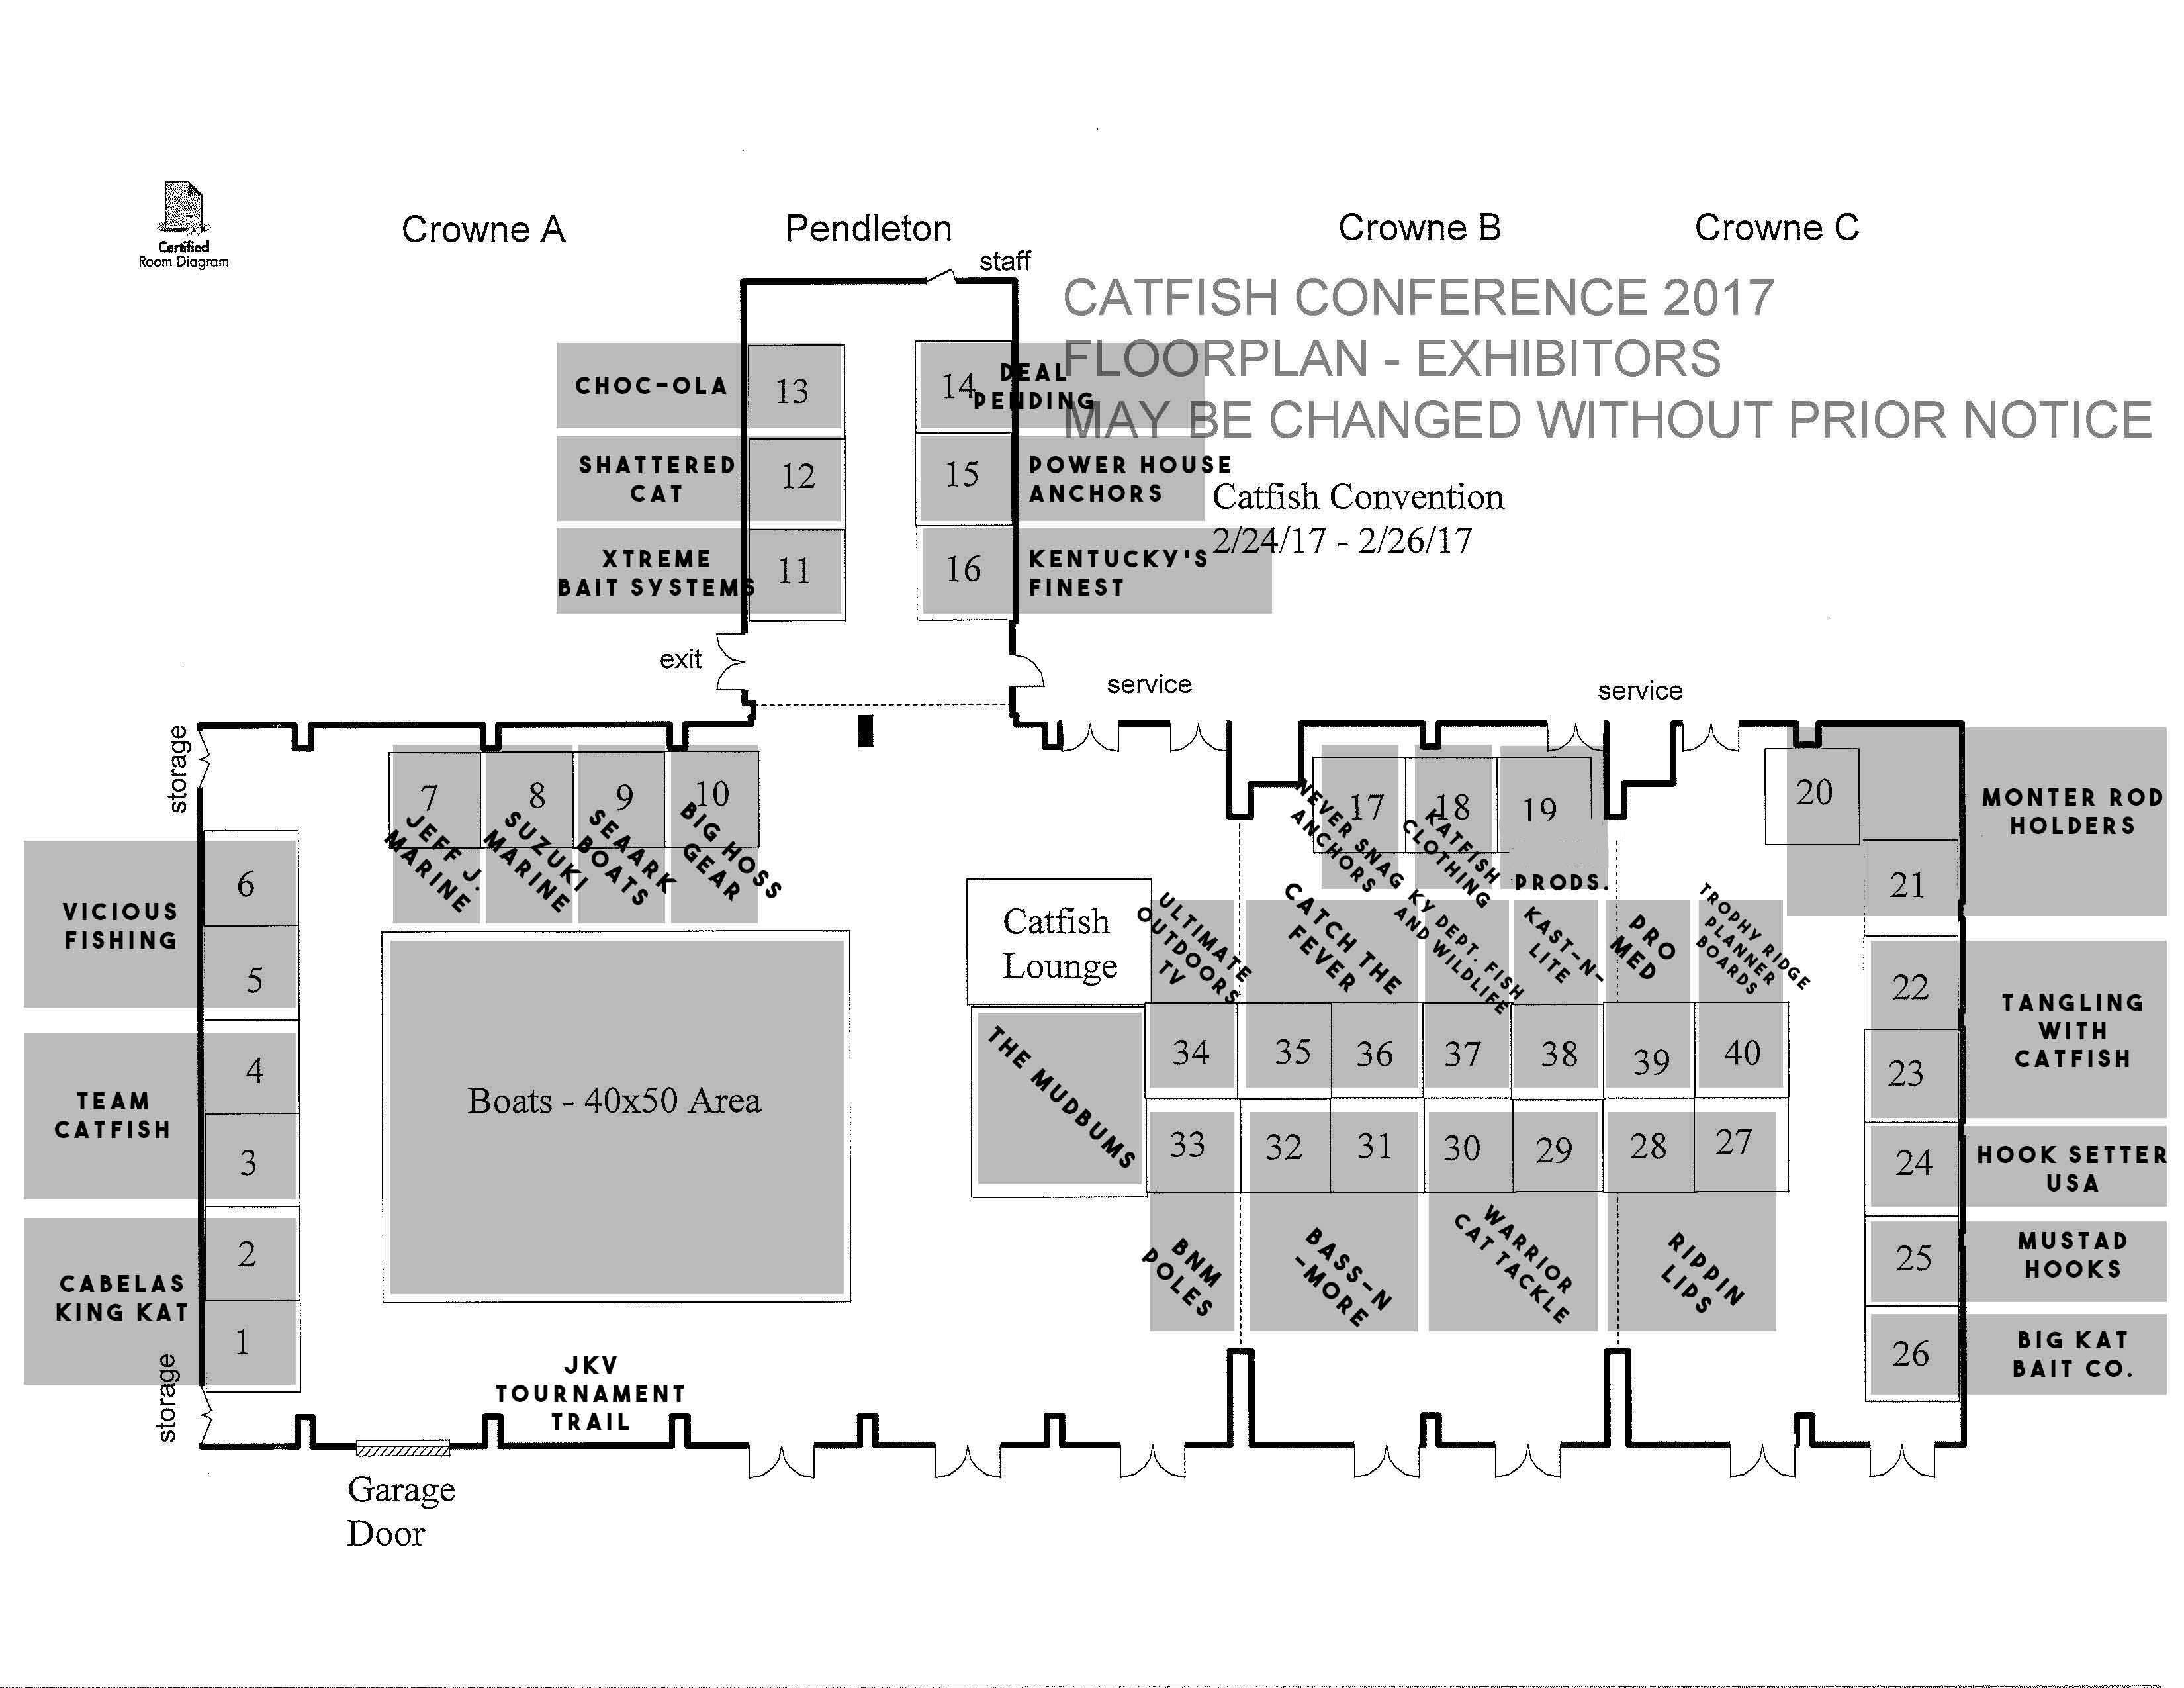 Catfish Conference FloorPlan Feb 16, 2017  Catfish Conference Floor-plan 2017 Catfish Conference FloorPlan Feb 16 2017 1